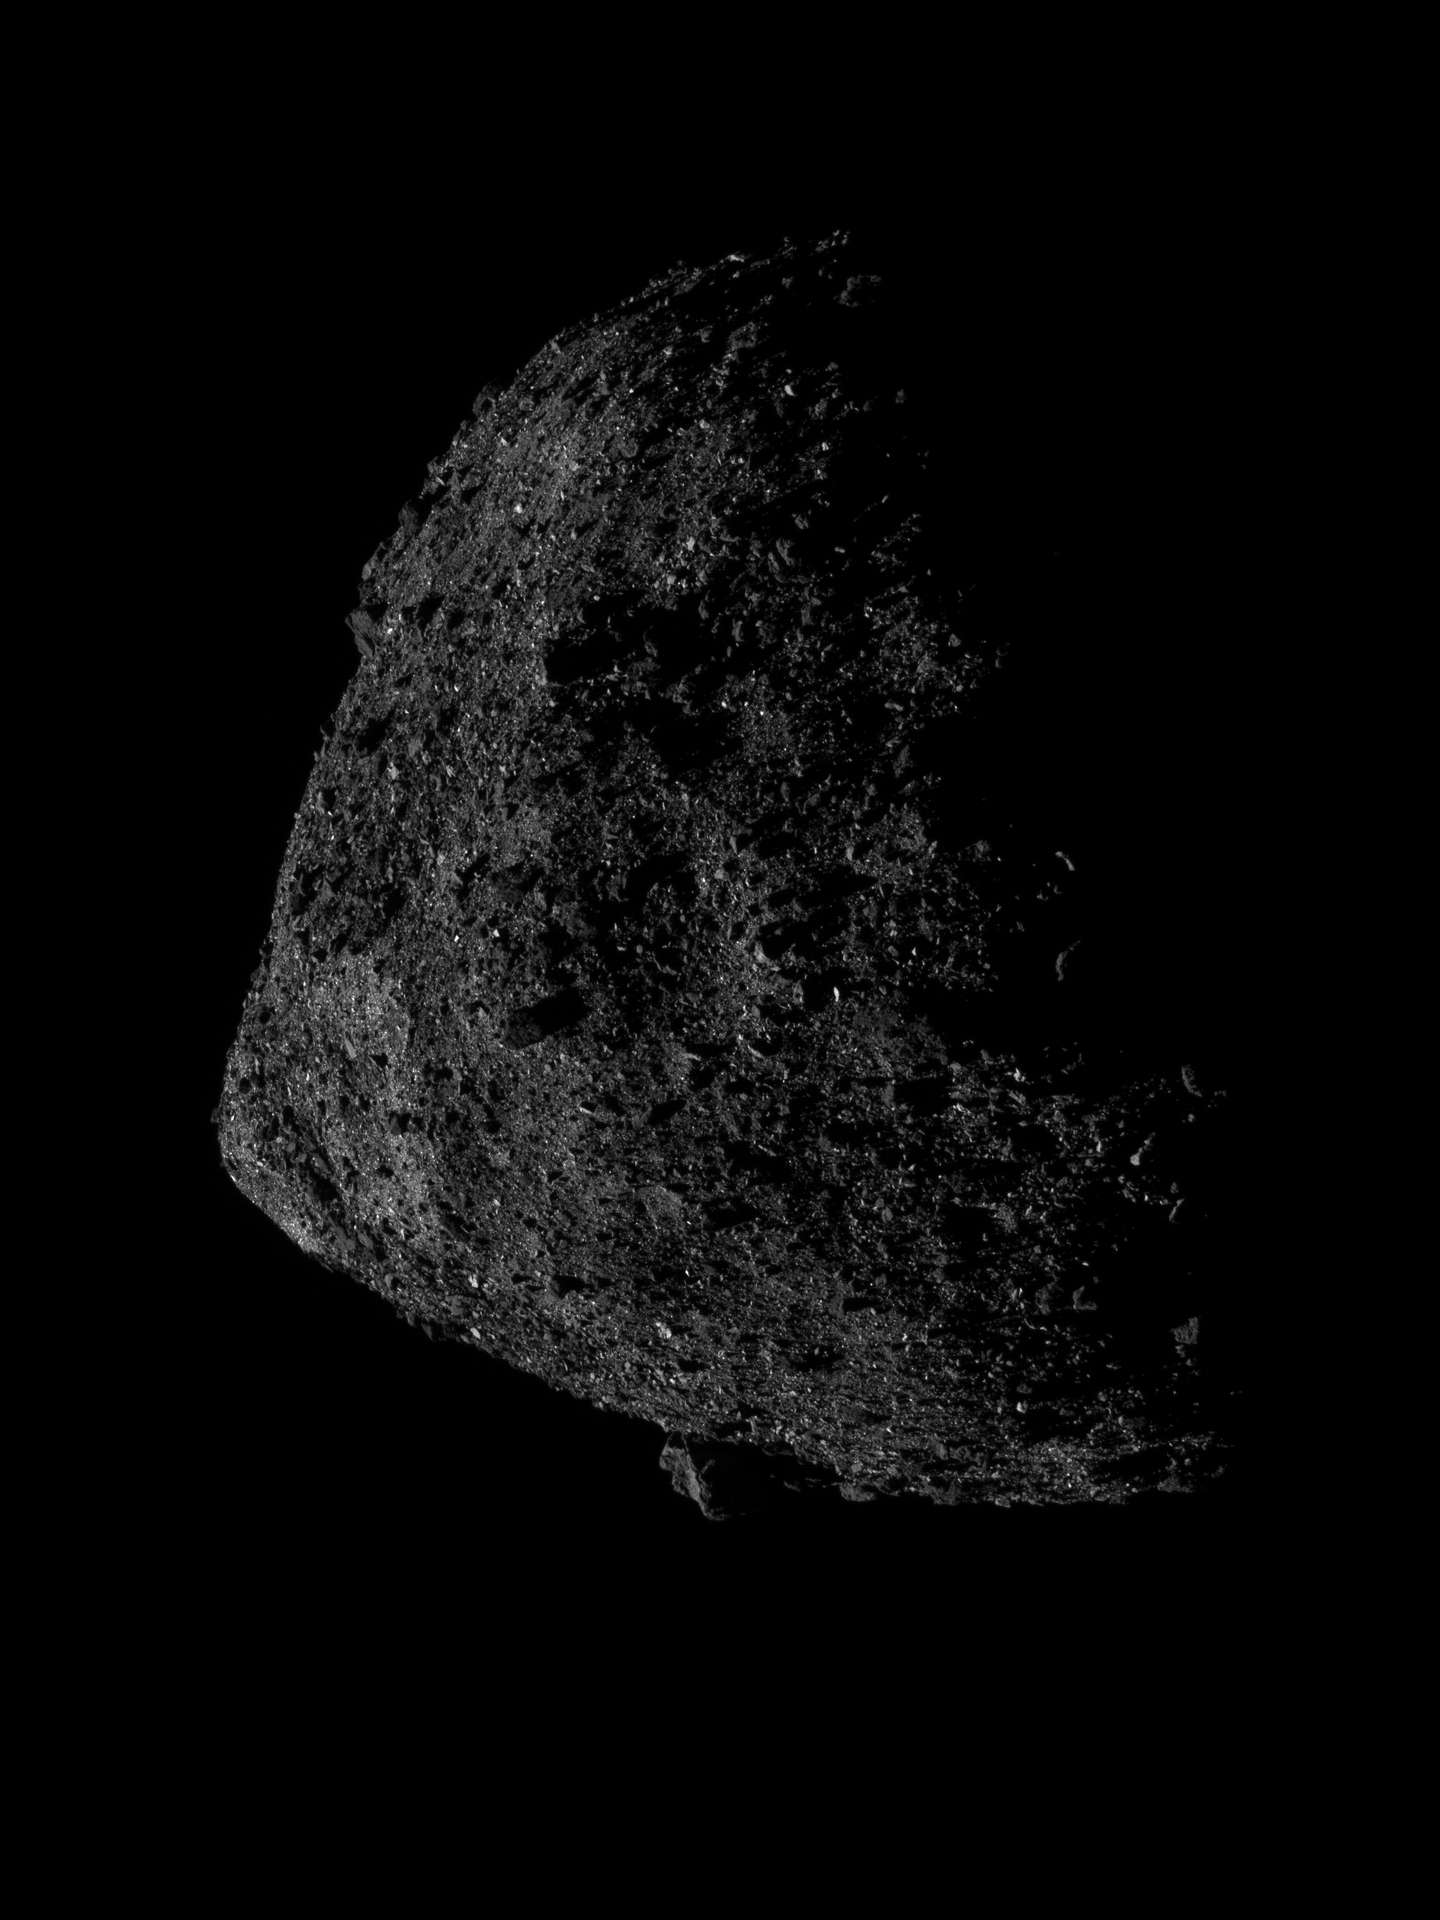 L'astéroïde Bennu le 13 juin 2019. © Nasa, Goddard, University of Arizona